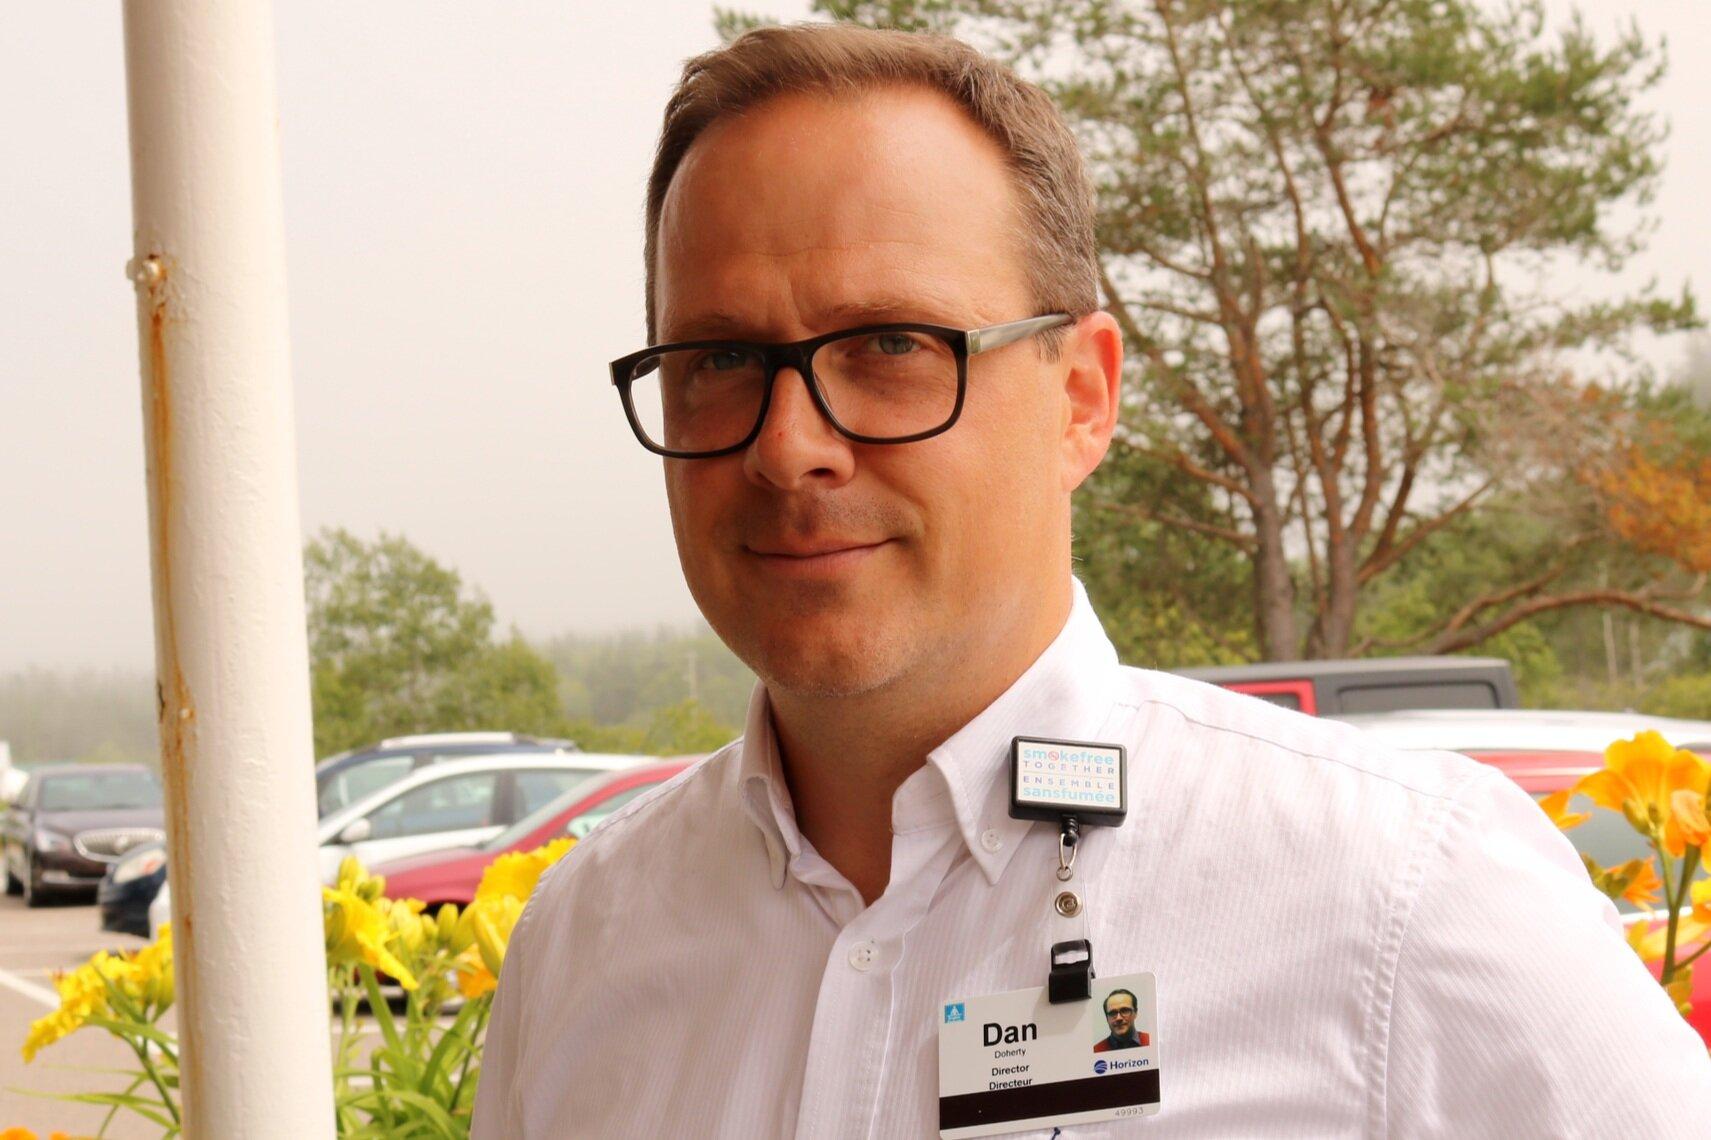 Dan Doherty - Director, Primary Health Care Program- Saint John Area, Horizon Health